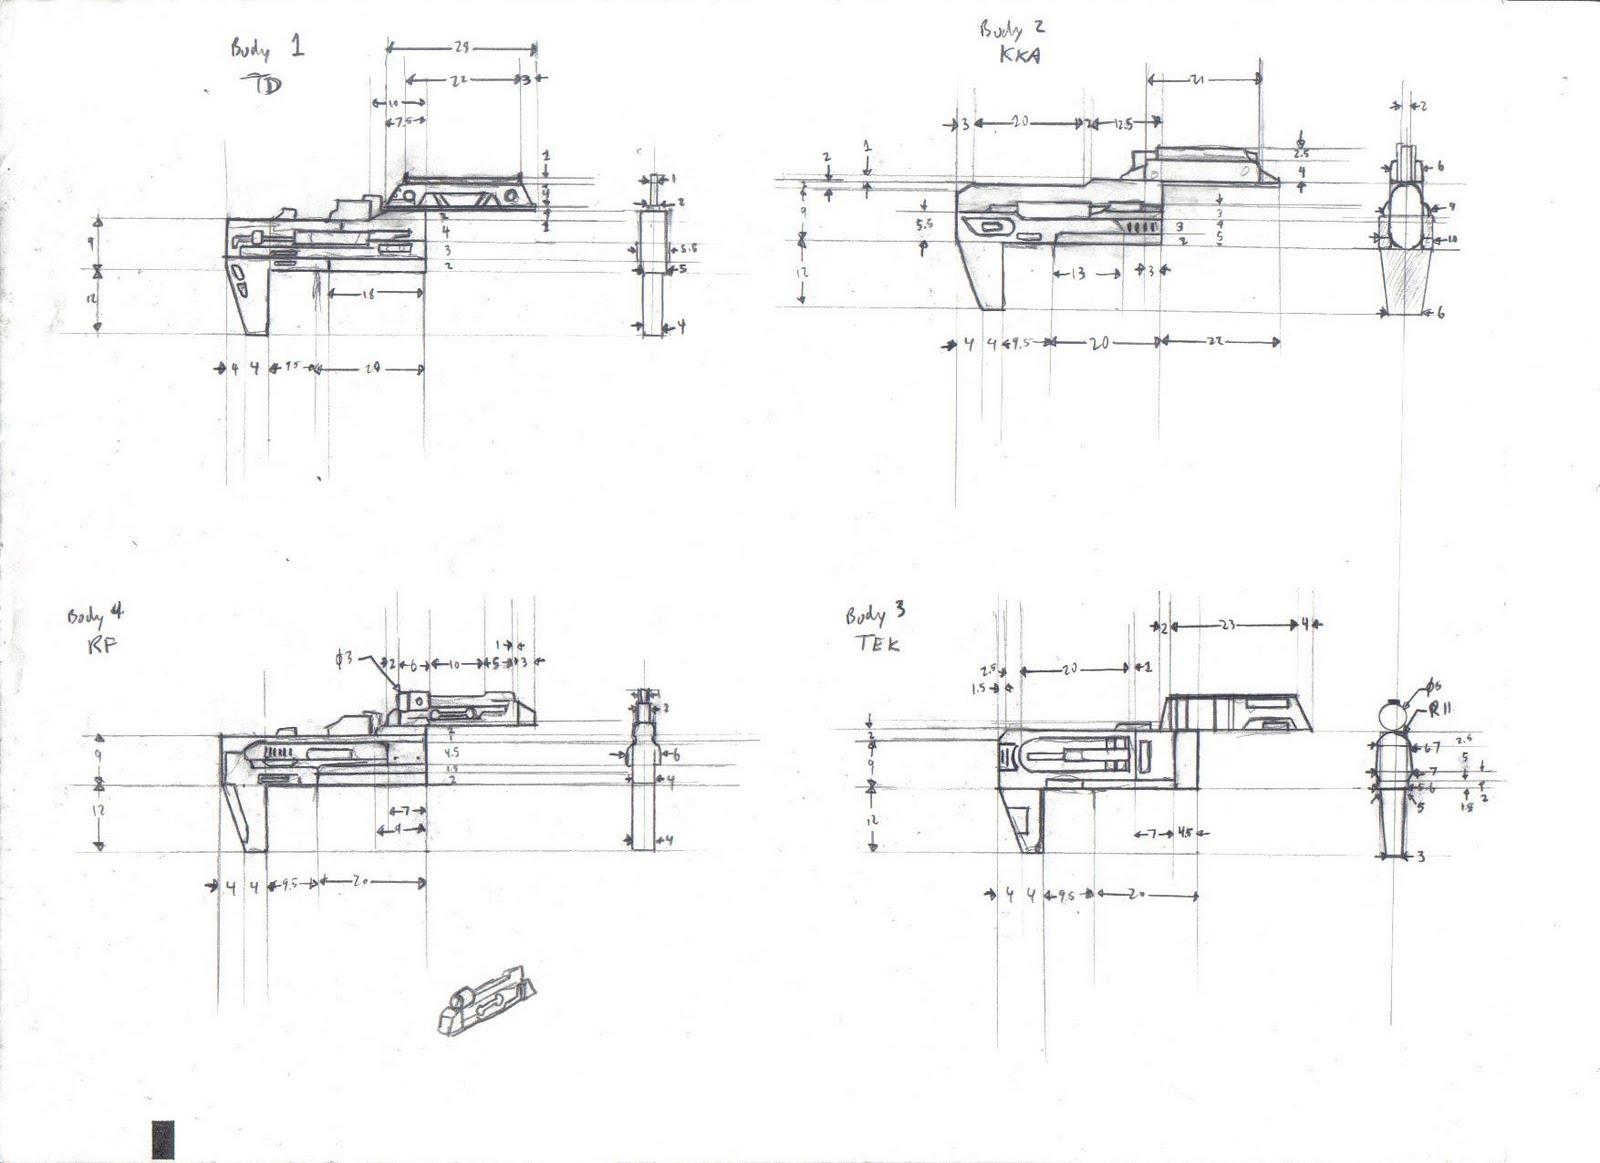 medium resolution of fn p90 diagram wiring diagram third level rh p 90 wirig diagram grease gun diagram glock